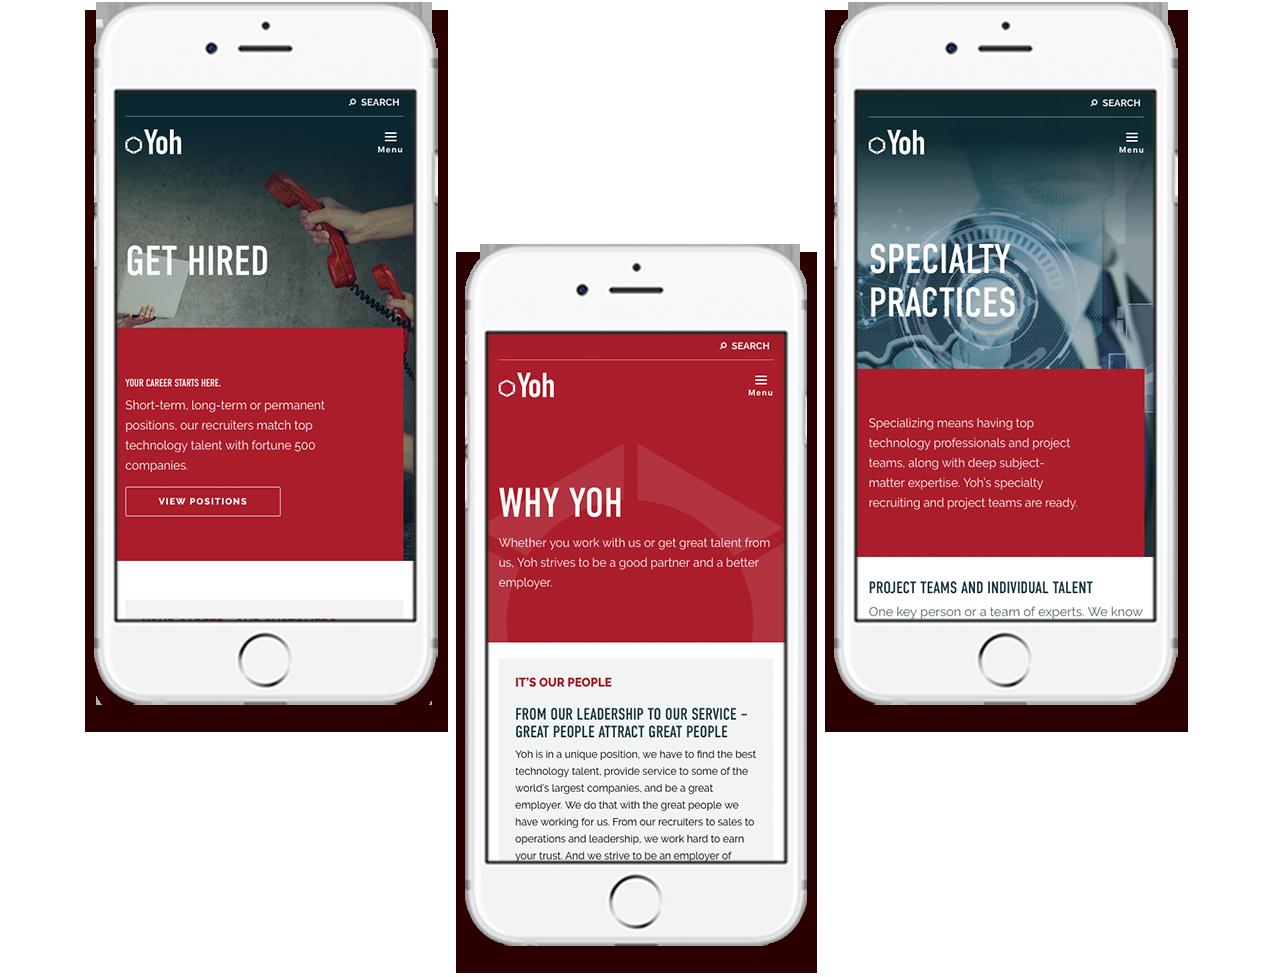 Yoh mobile responsive website design examples on three phones